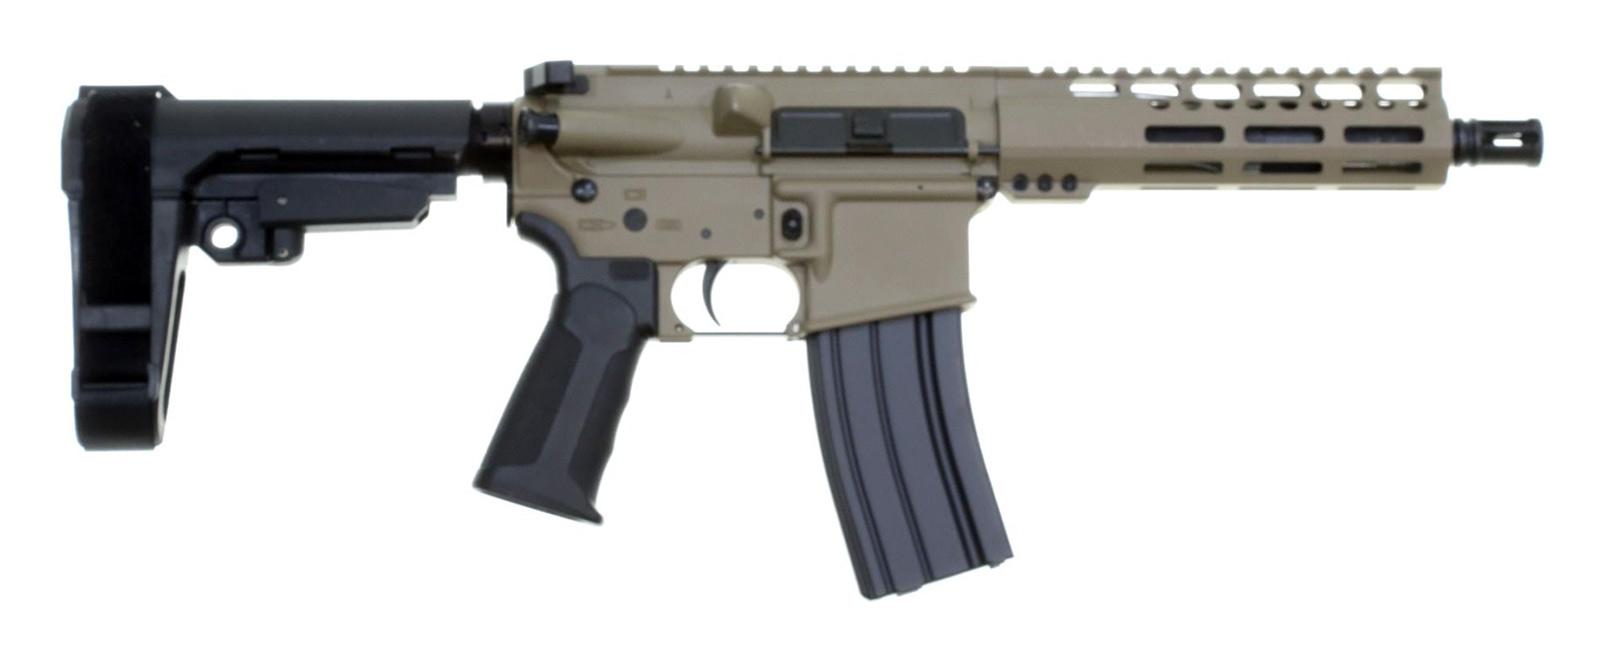 cbc-ps2-forged-aluminum-ar-pistol-fde-5-56nato-7-5-barrel-7-m-lok-rail-sba3-brace